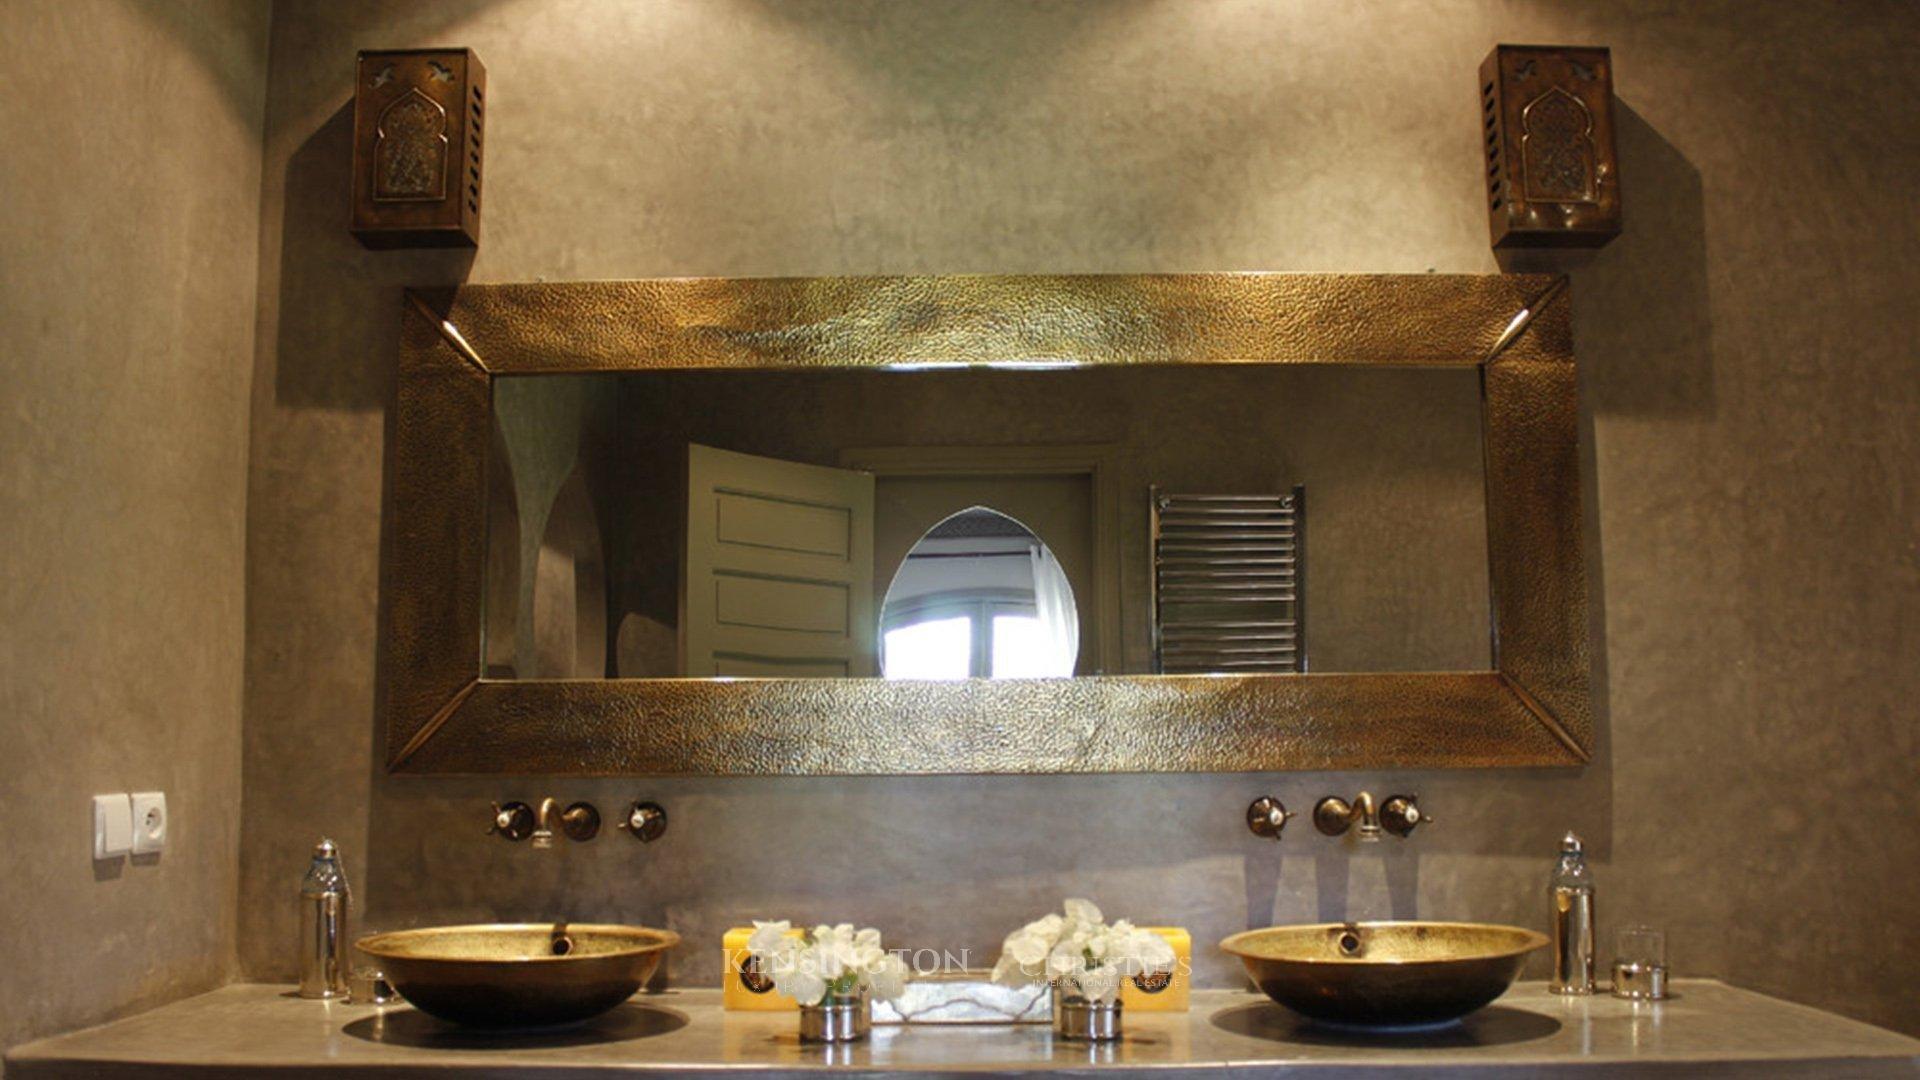 KPPM00557: Villa Salma Luxury Villa Marrakech Morocco